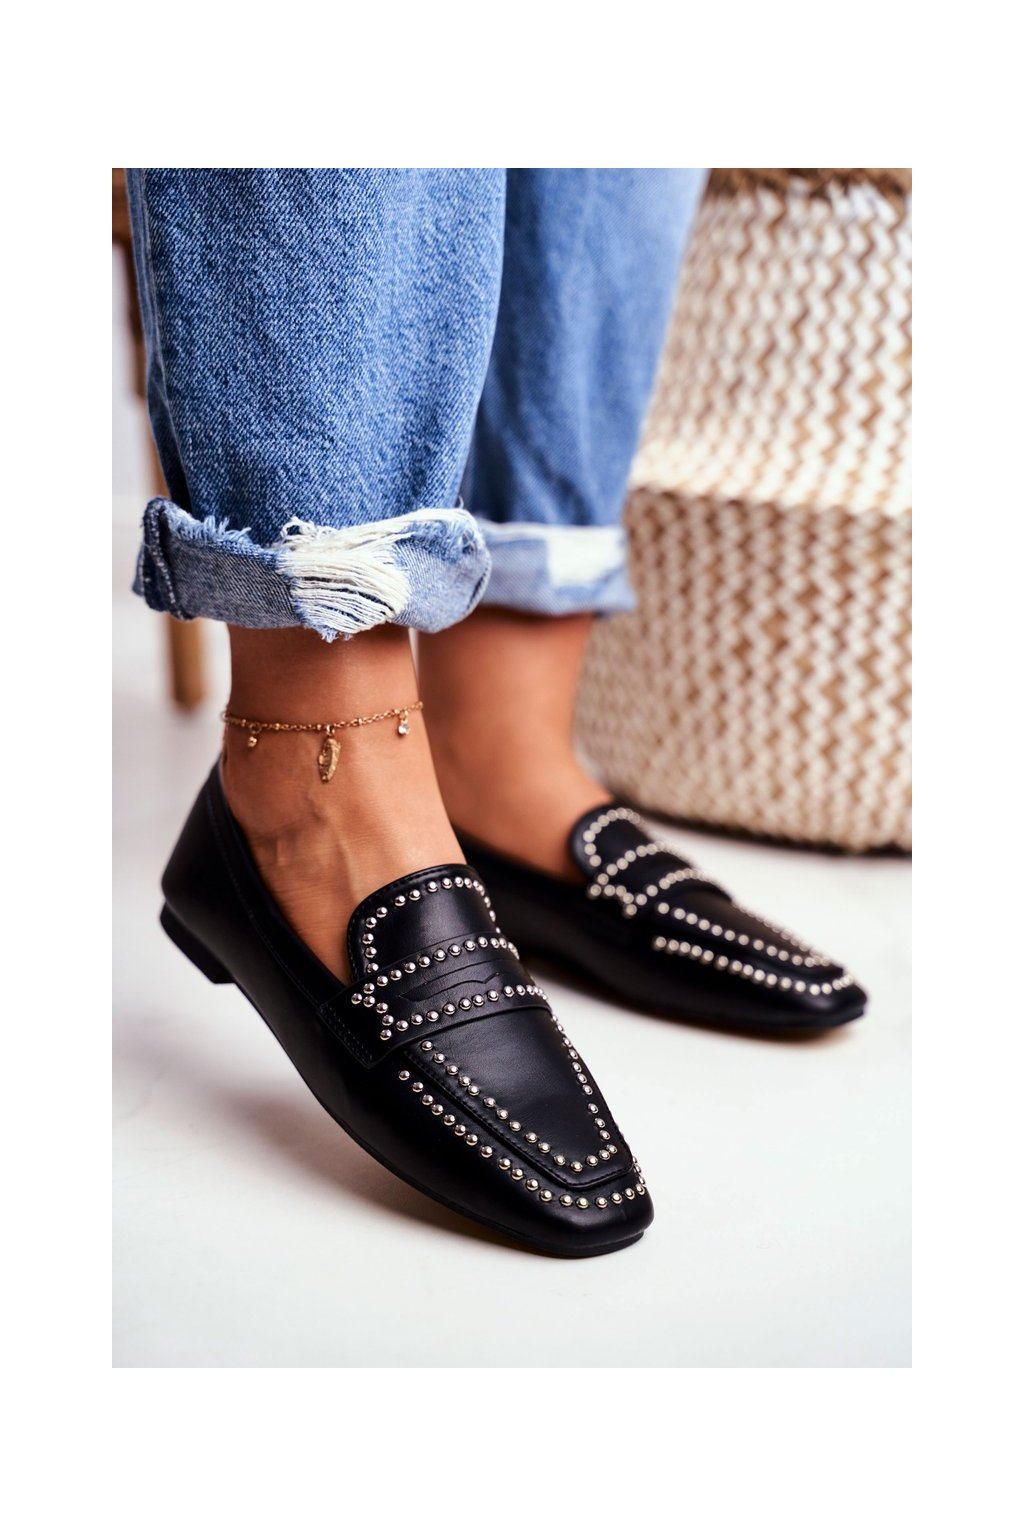 Dámske mokasíny farba čierna kód obuvi 588B-TA1 BLK PU